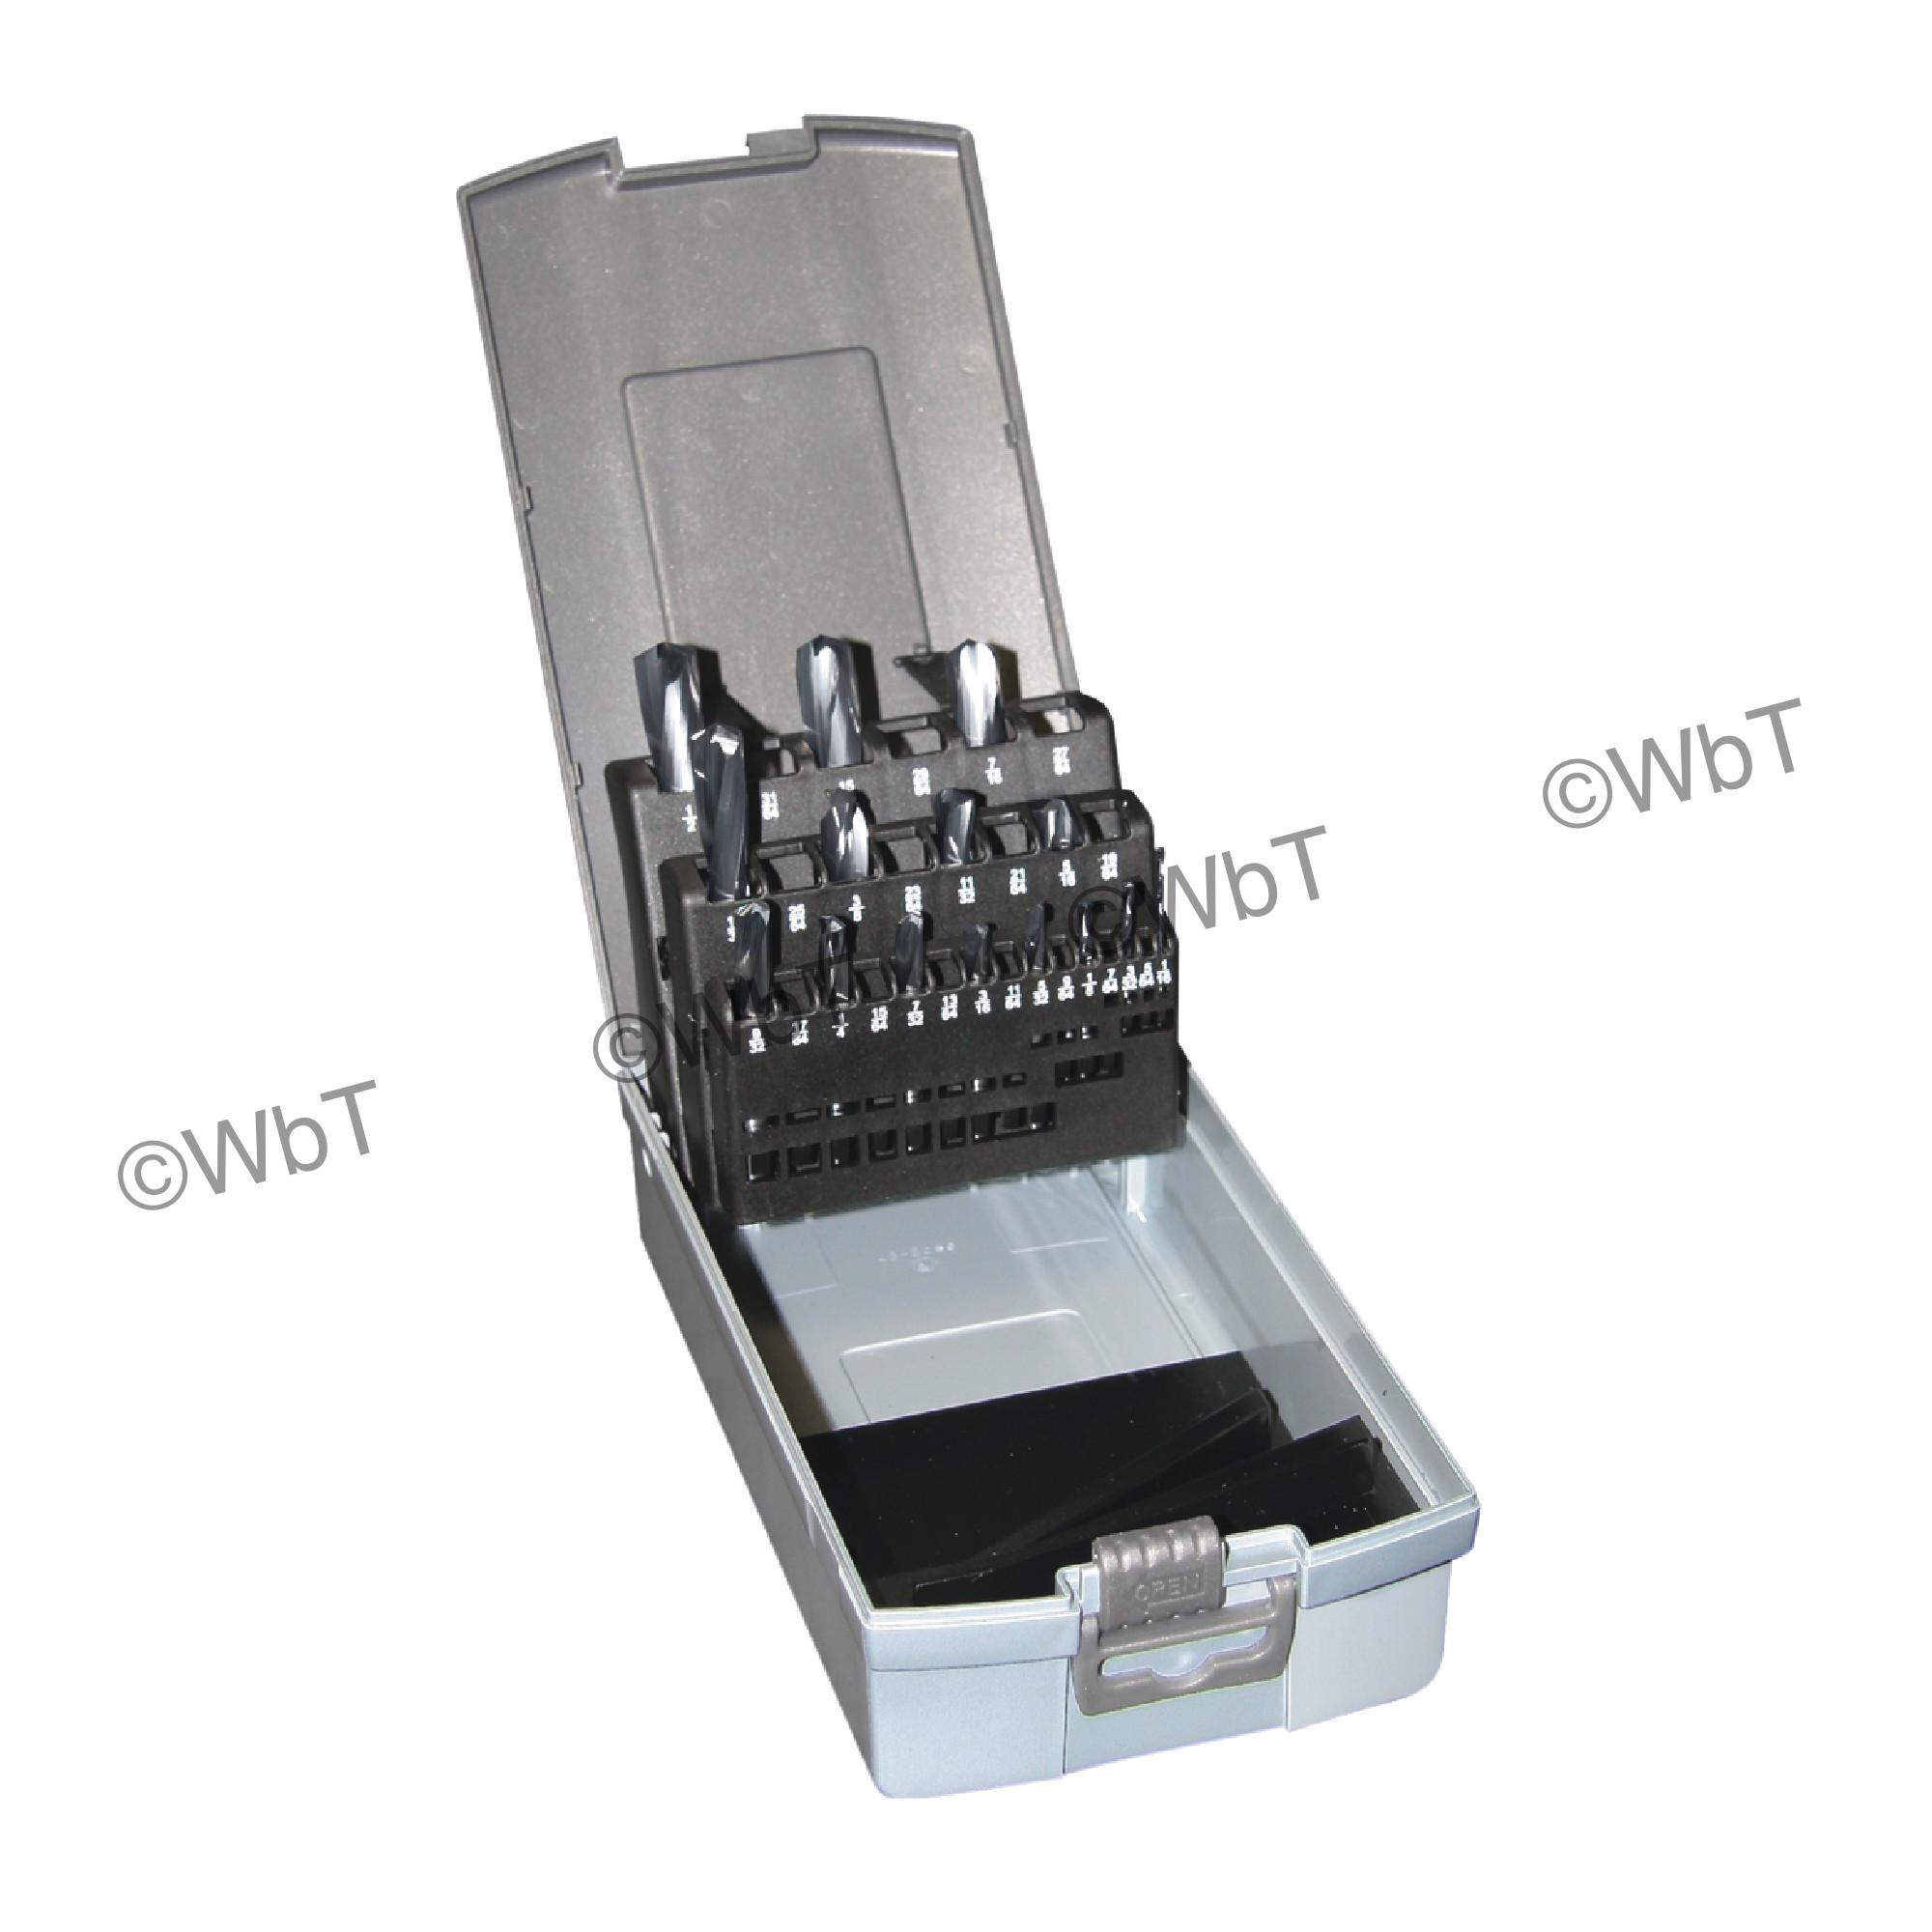 15 Piece Solid Carbide Screw Machine Length 118 degree AlTiN Drill Set